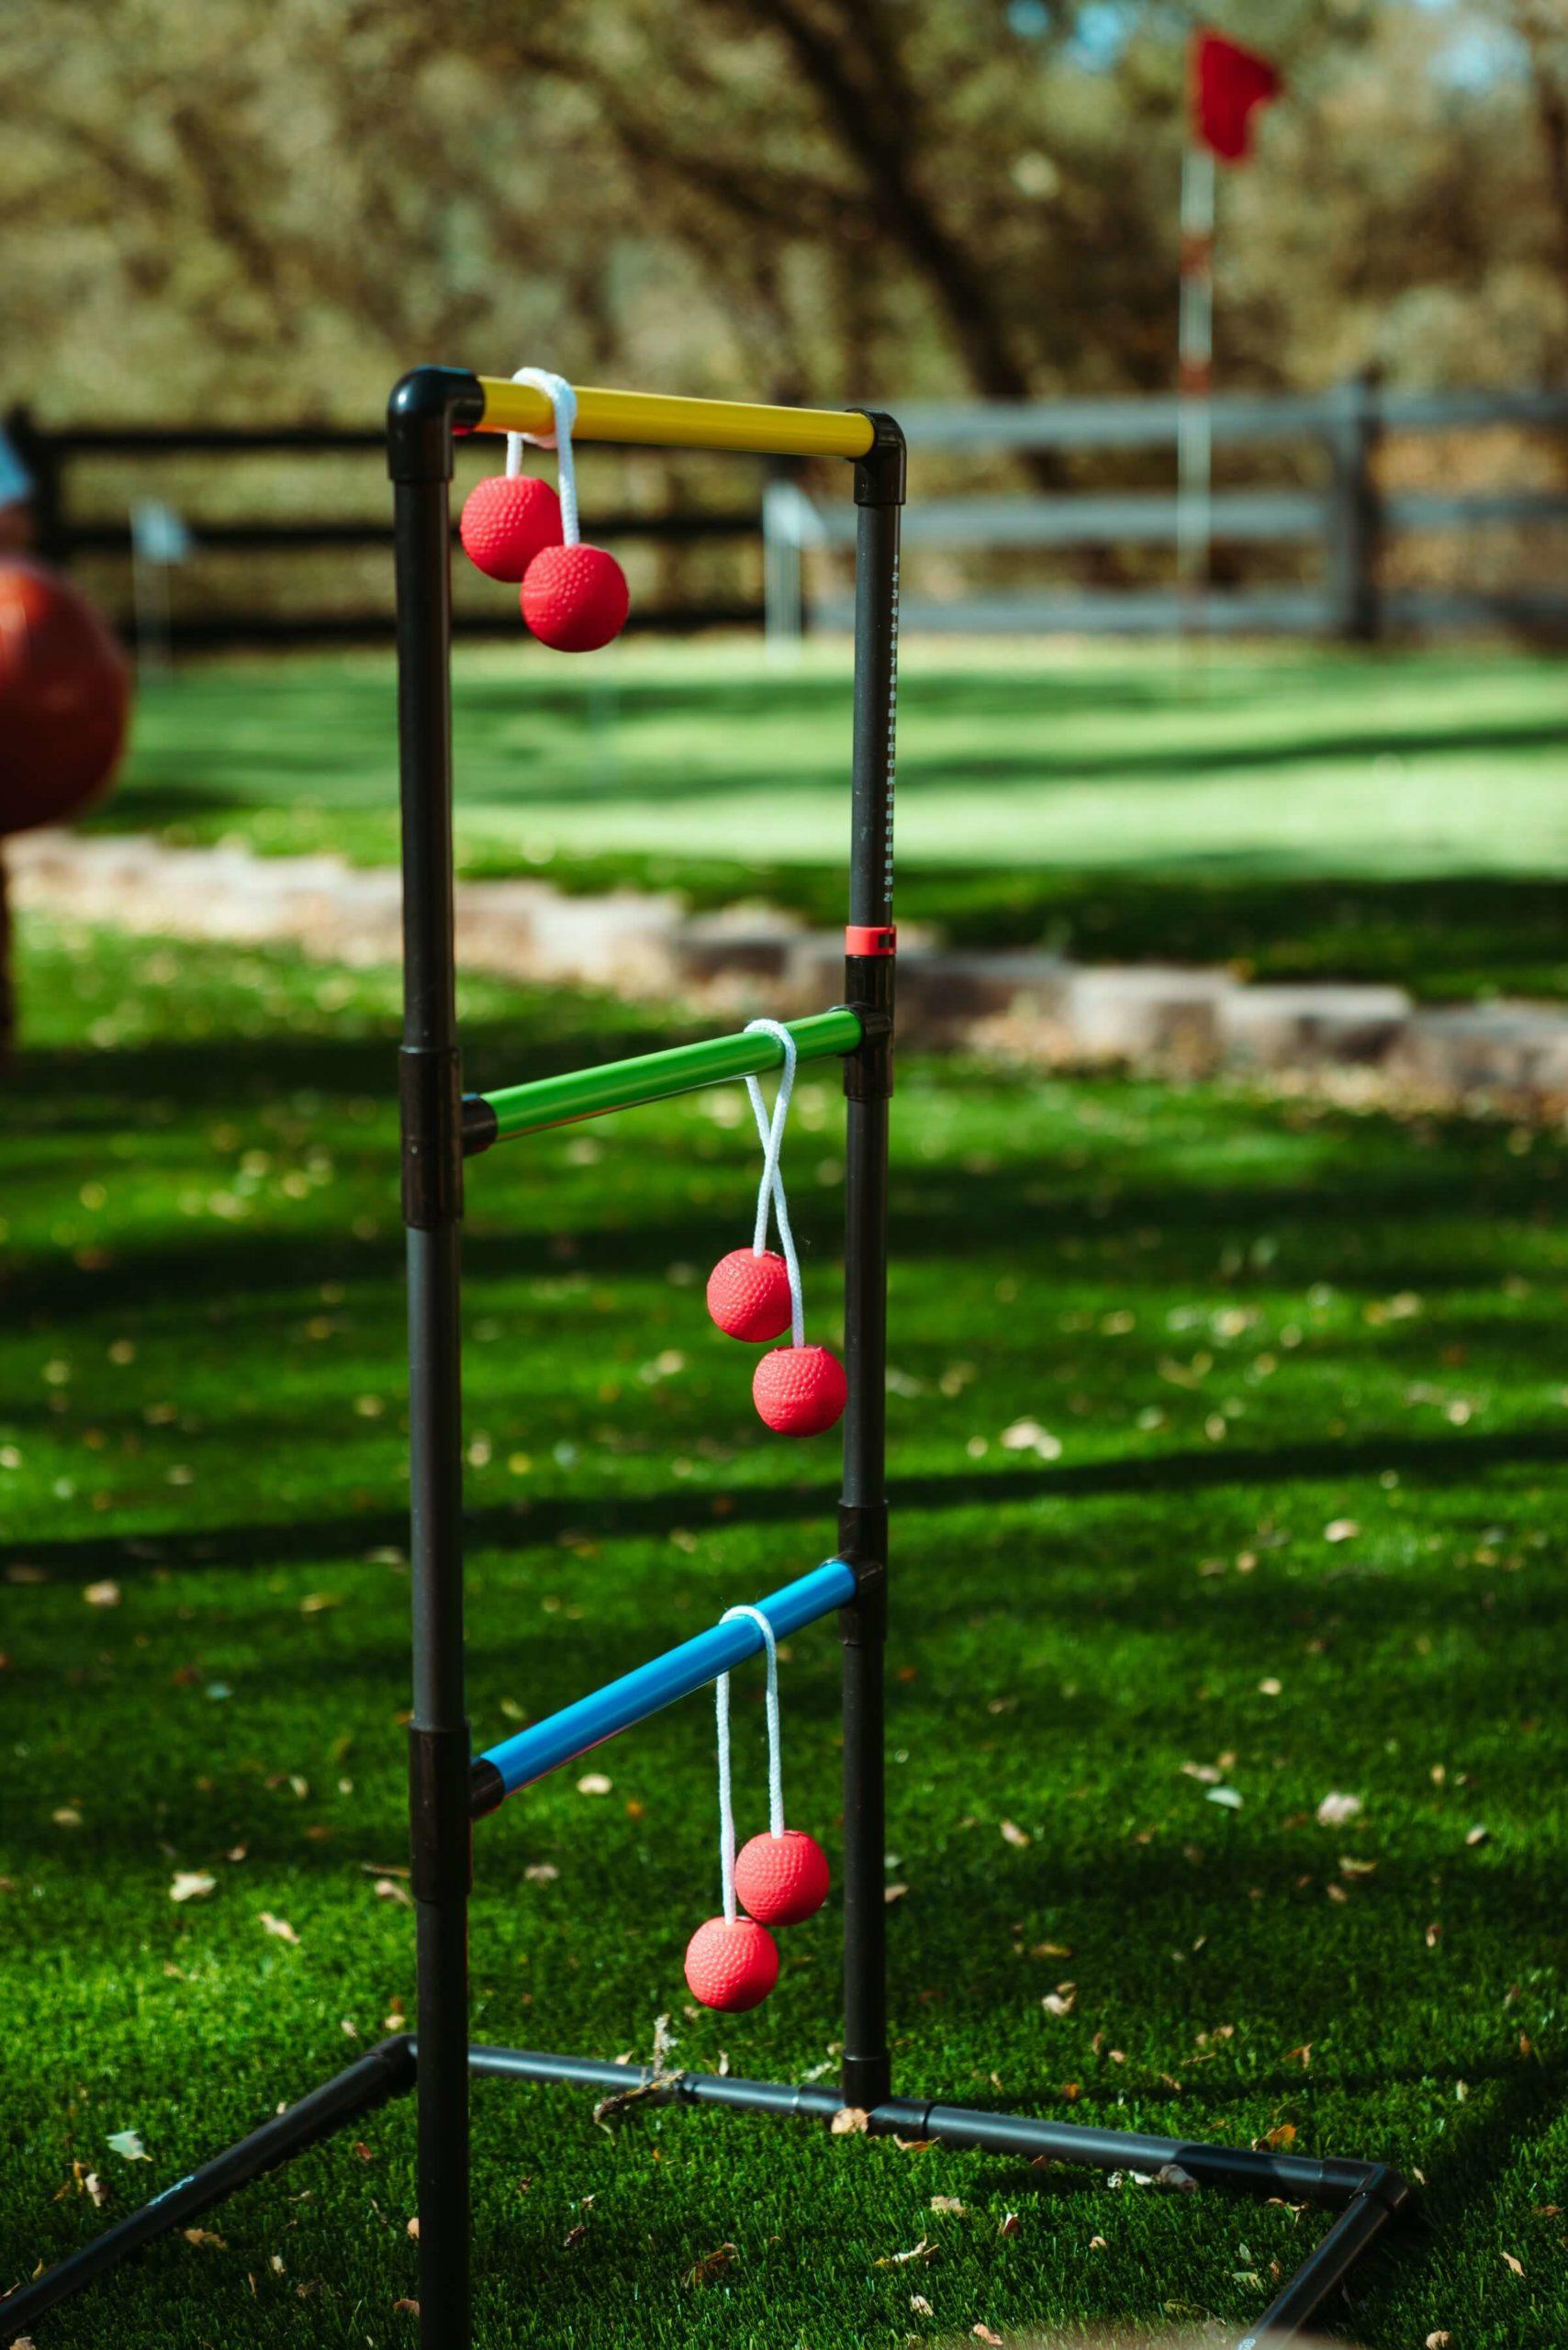 Ladder Ball tailgate game